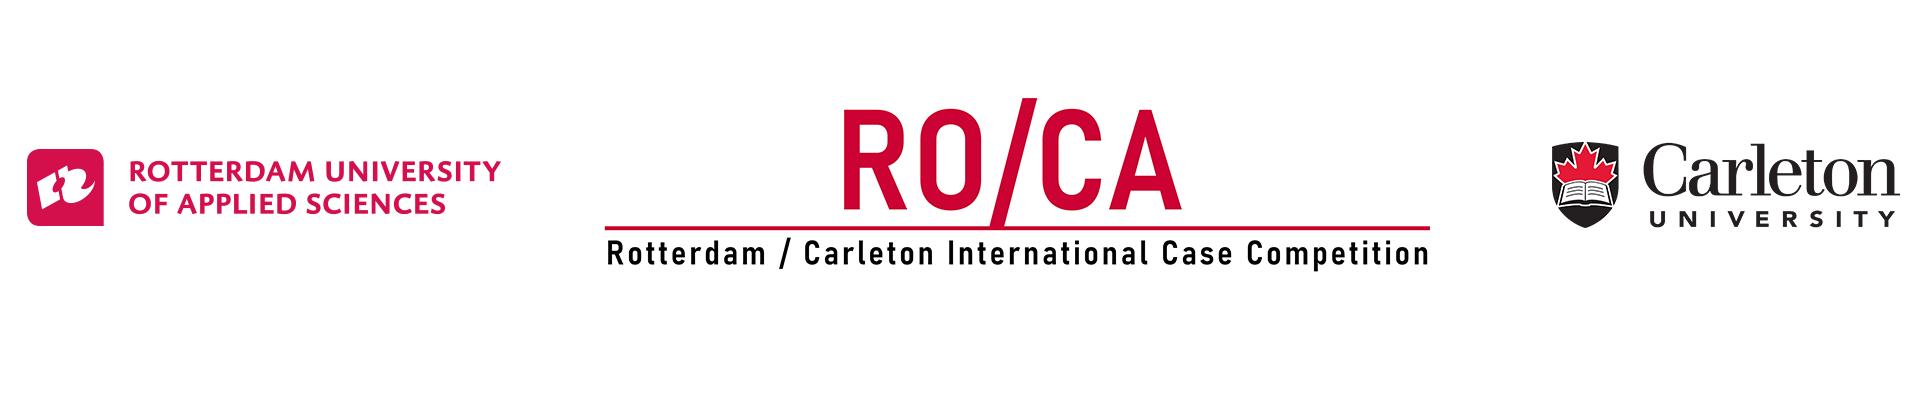 3. ROCA 2020 EVENTS  ROTTERDAM – CARLETON INTERNATIONAL CASE COMPETITION  (Kopie)